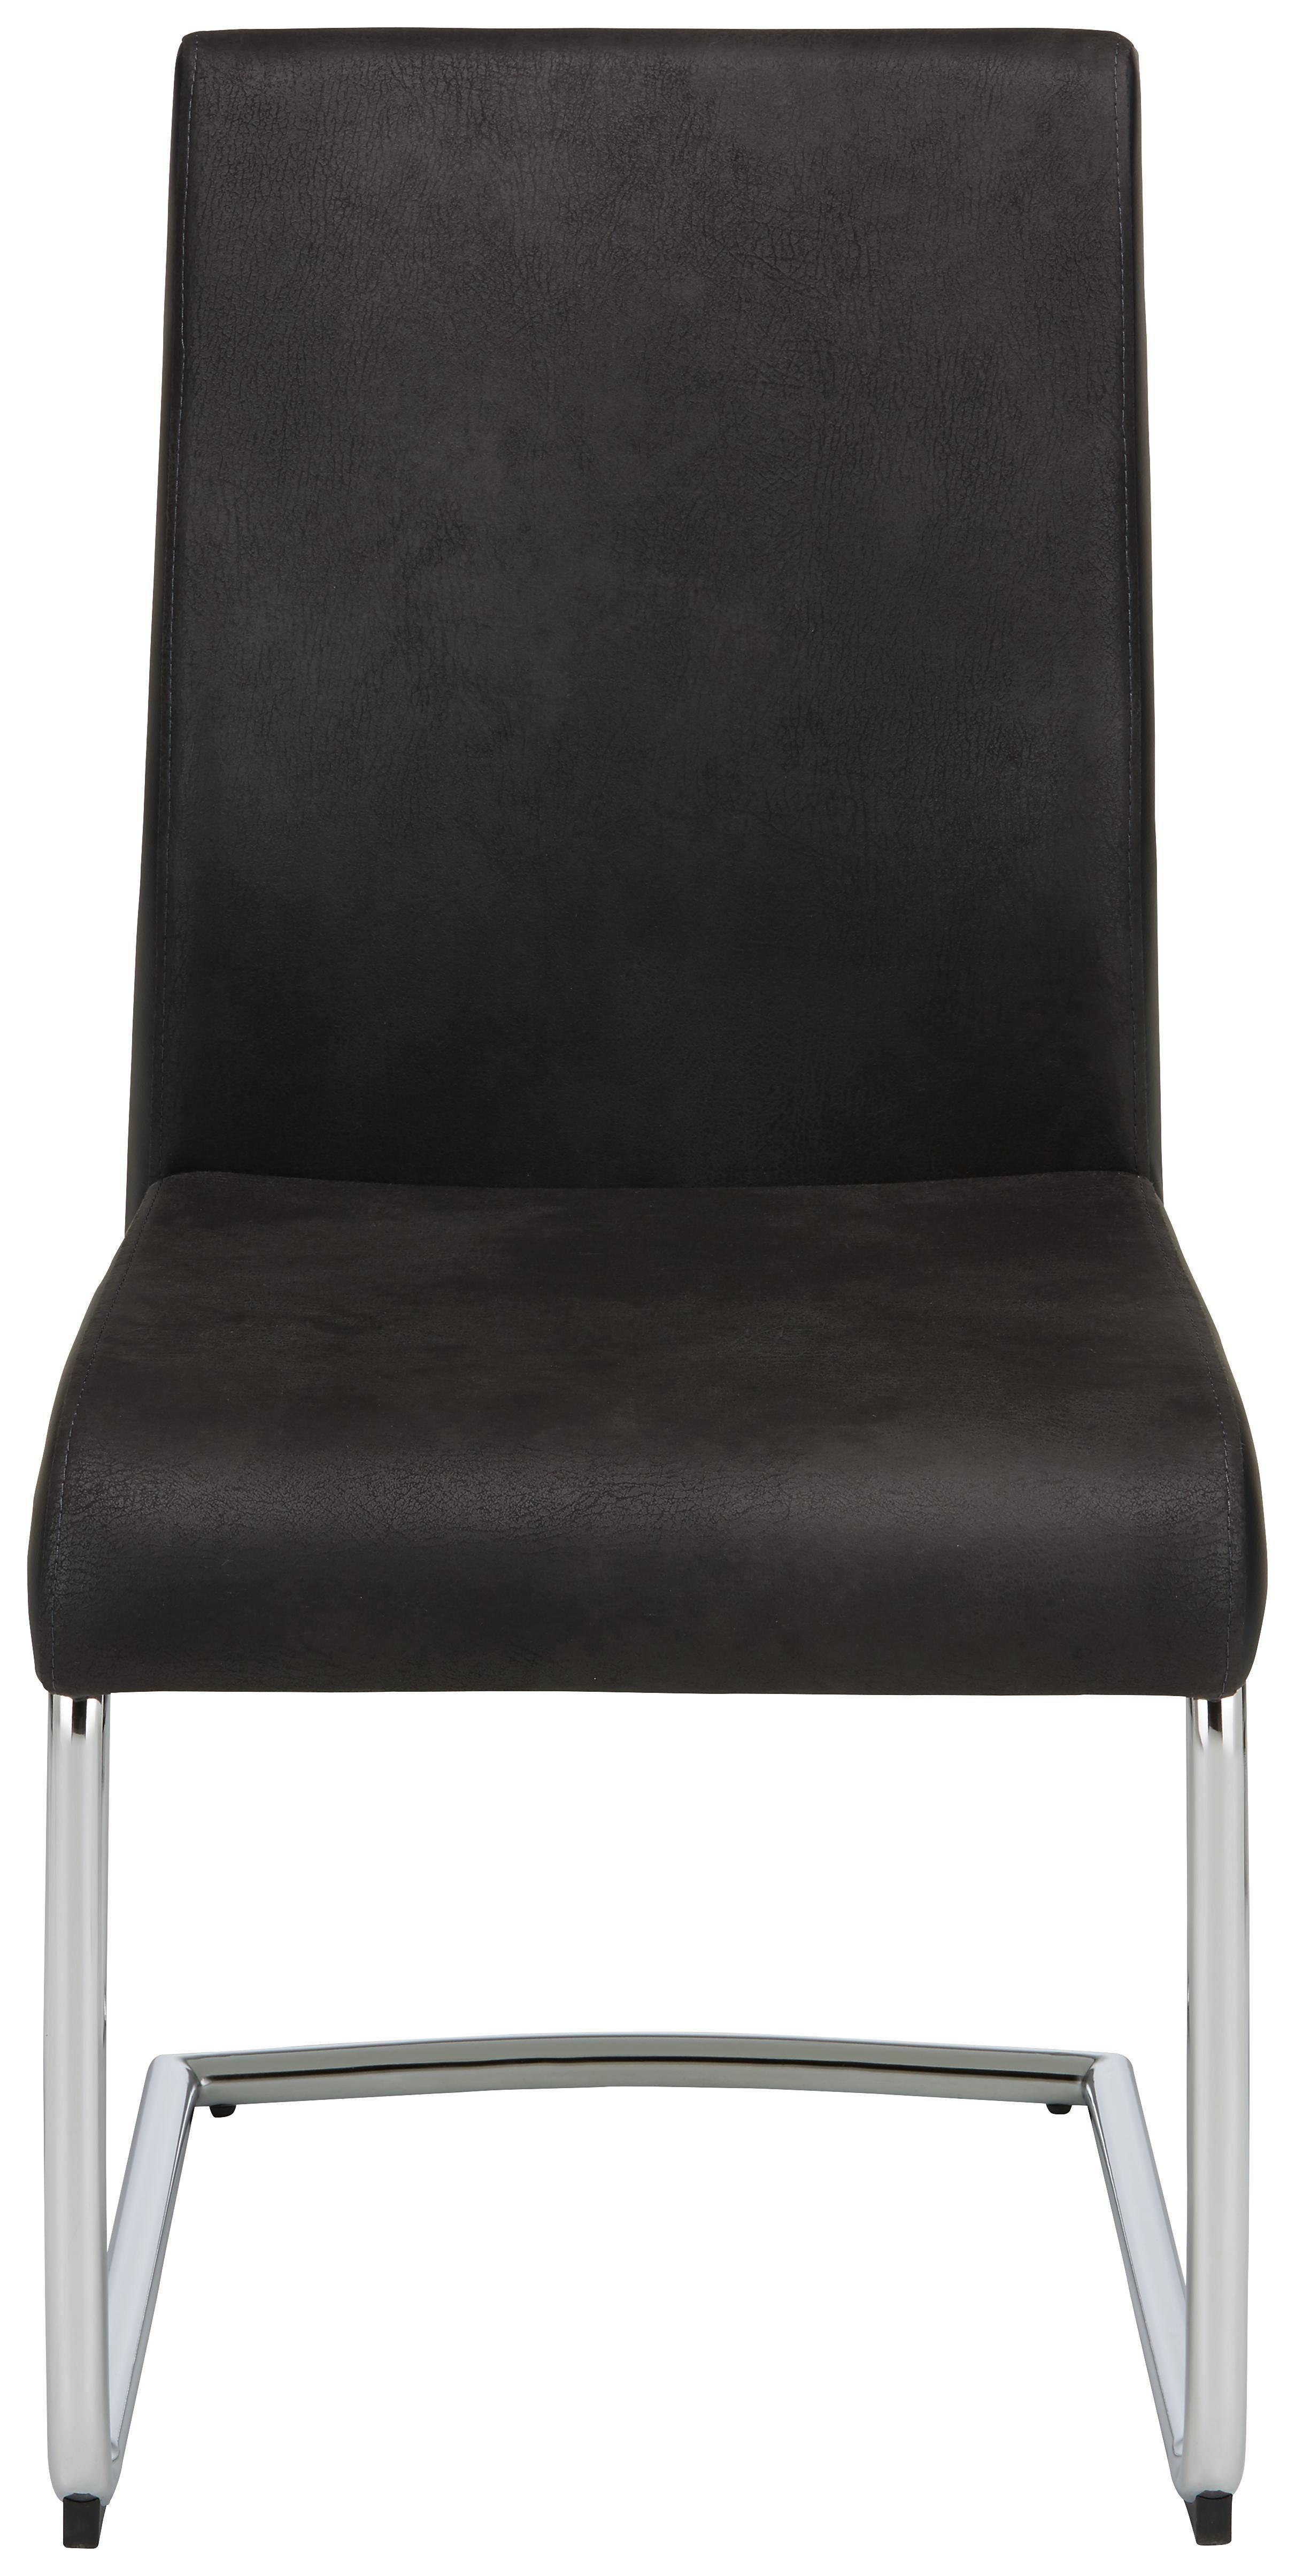 70 Nice Schwingstuhl Schwarz Sofa Design Chair Furniture